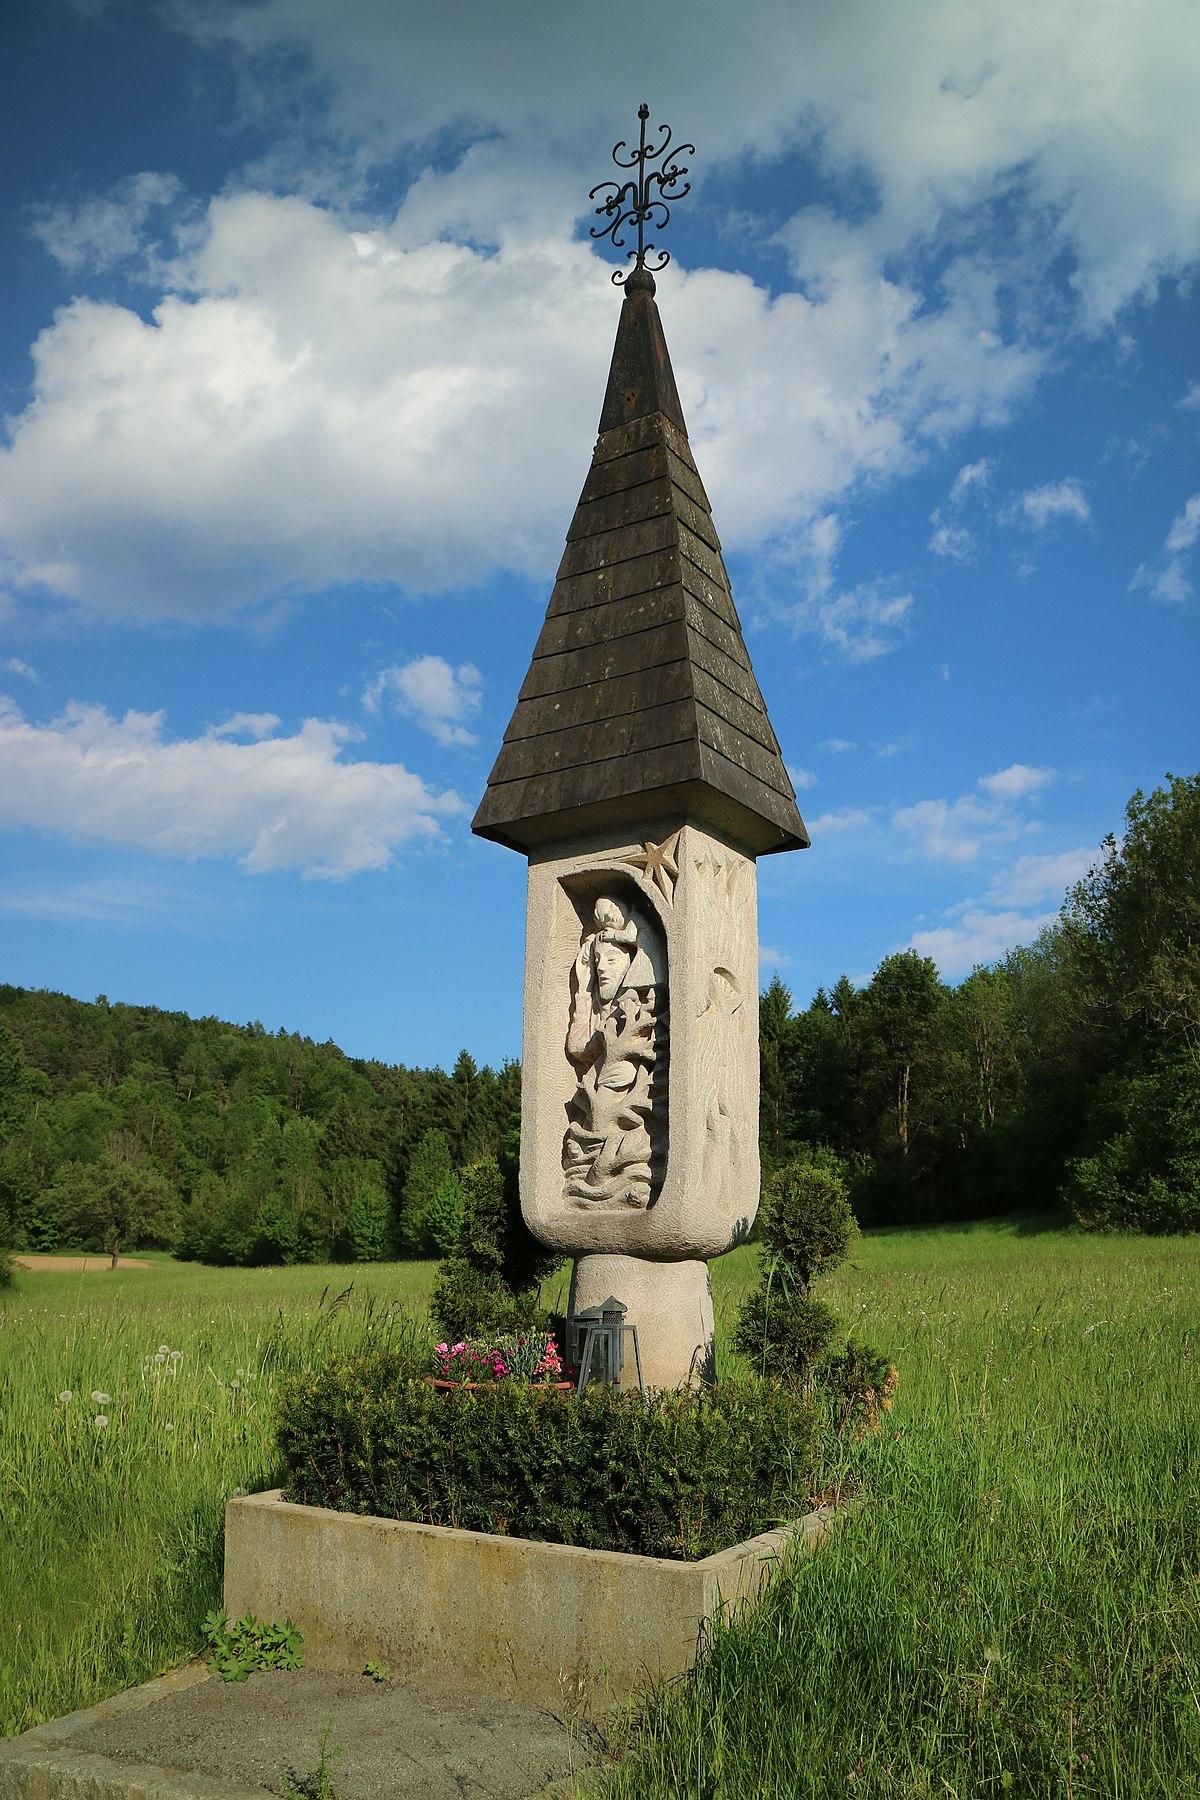 St. Hobbyhure Graz Wetzelsdorf